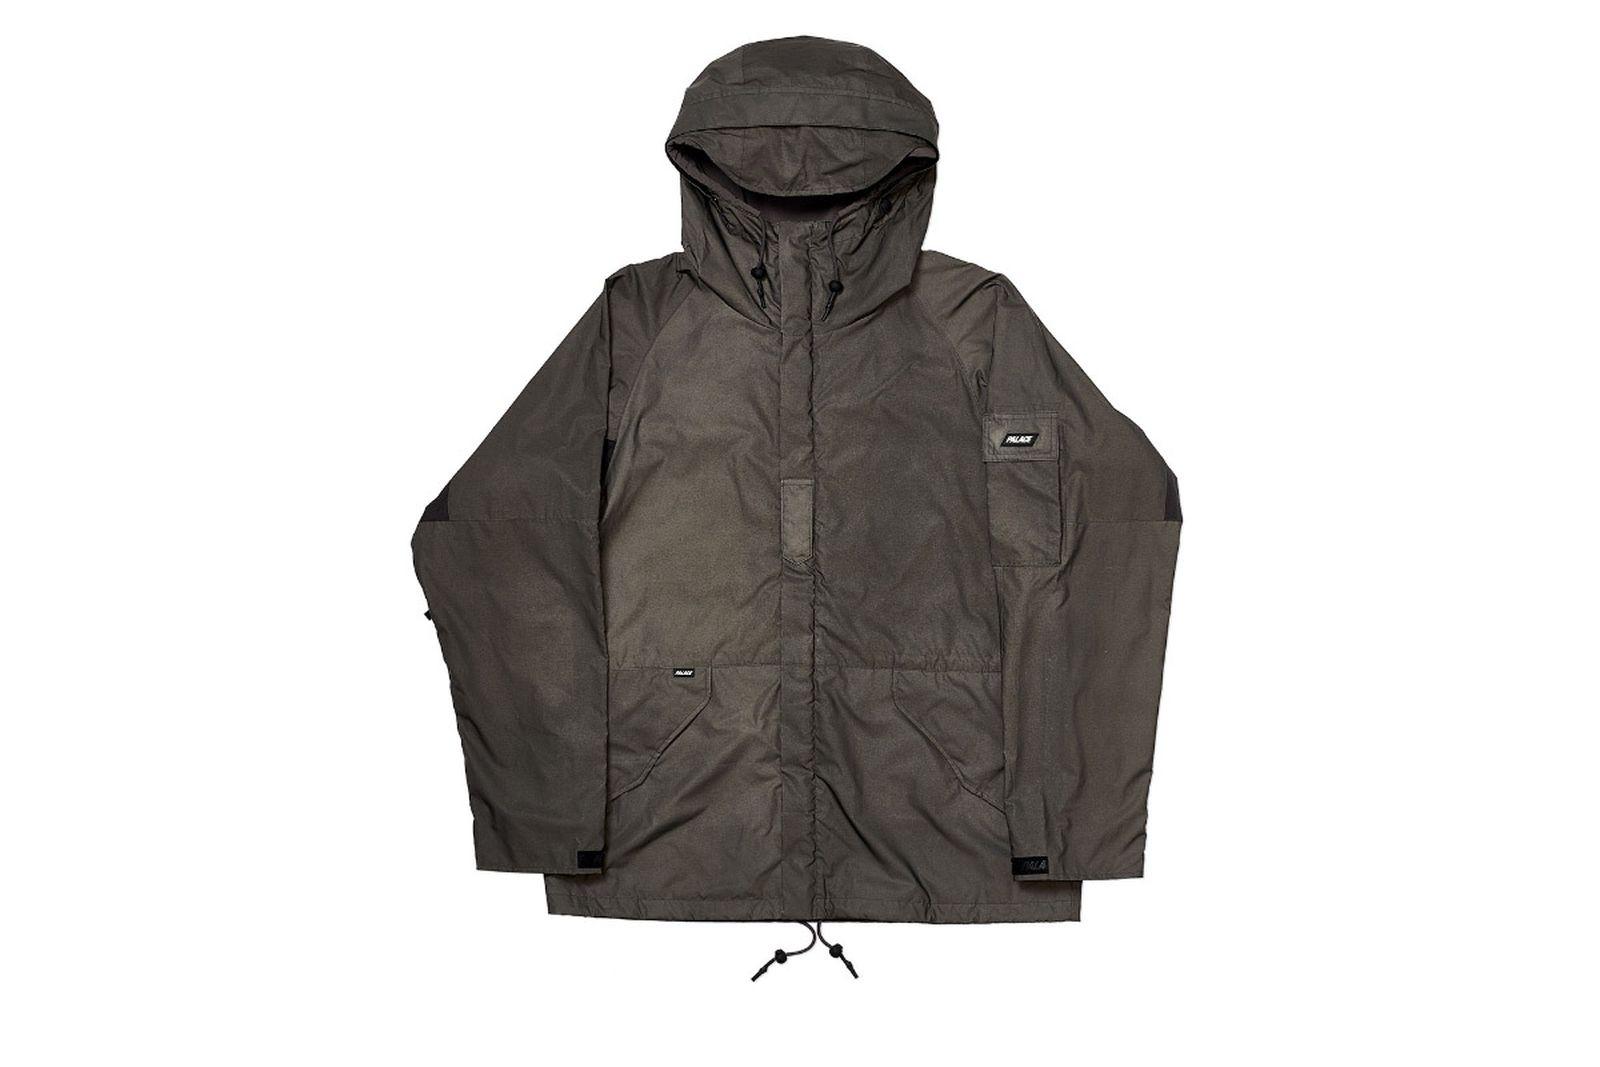 Palace 2019 Autumn Jacket Deflector grey front fw19